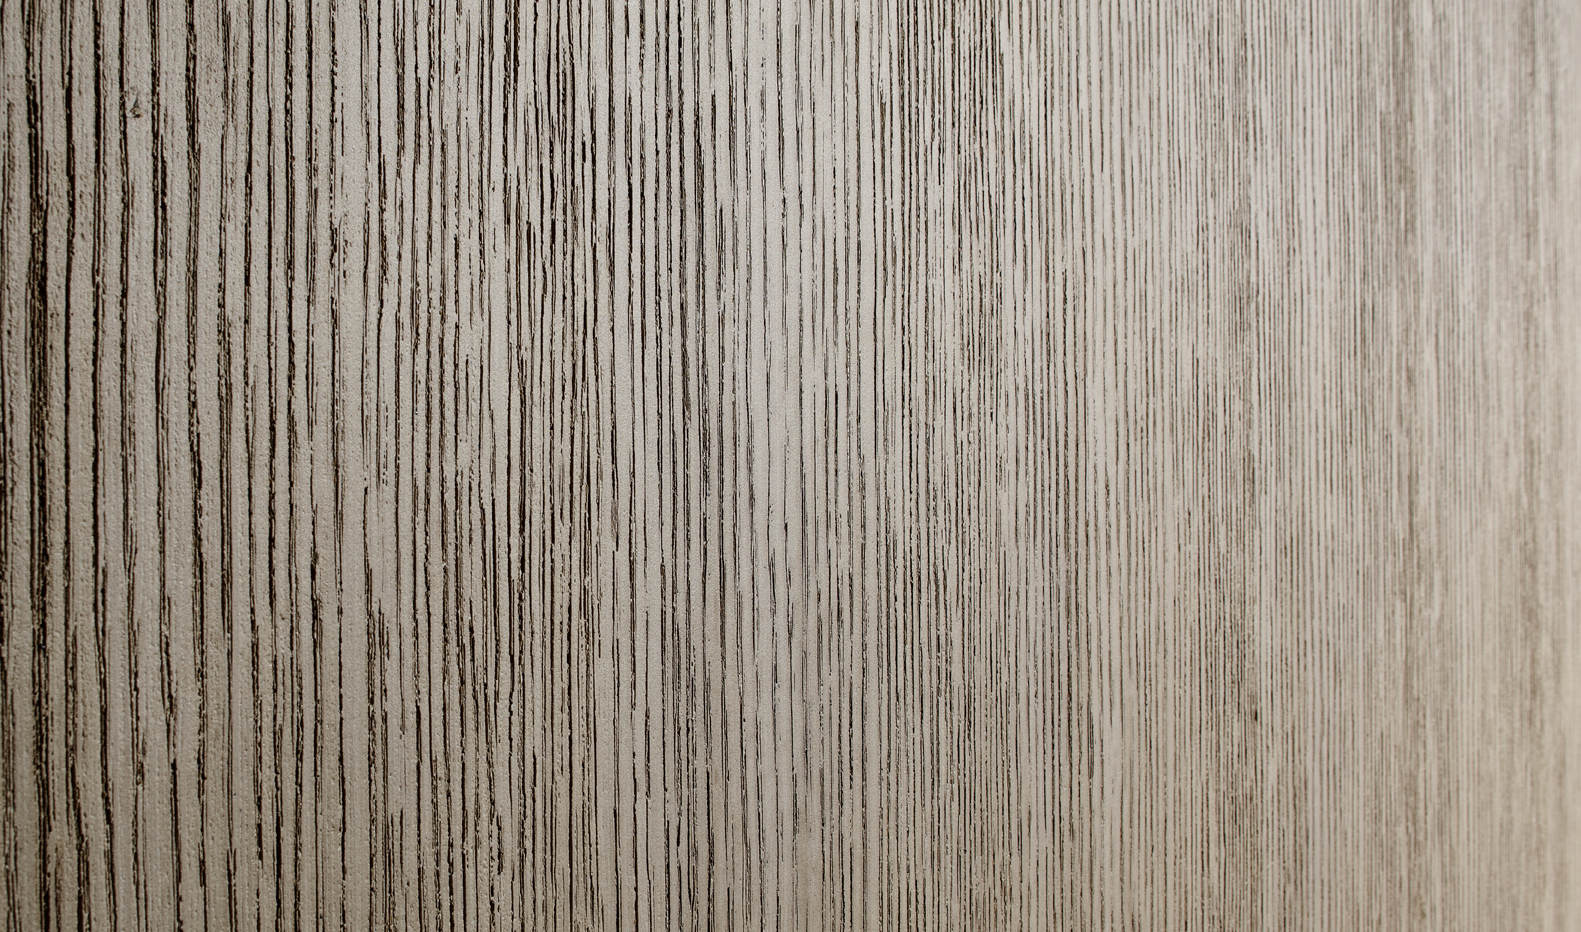 grafite_brown_limestone_Detail_04.jpg